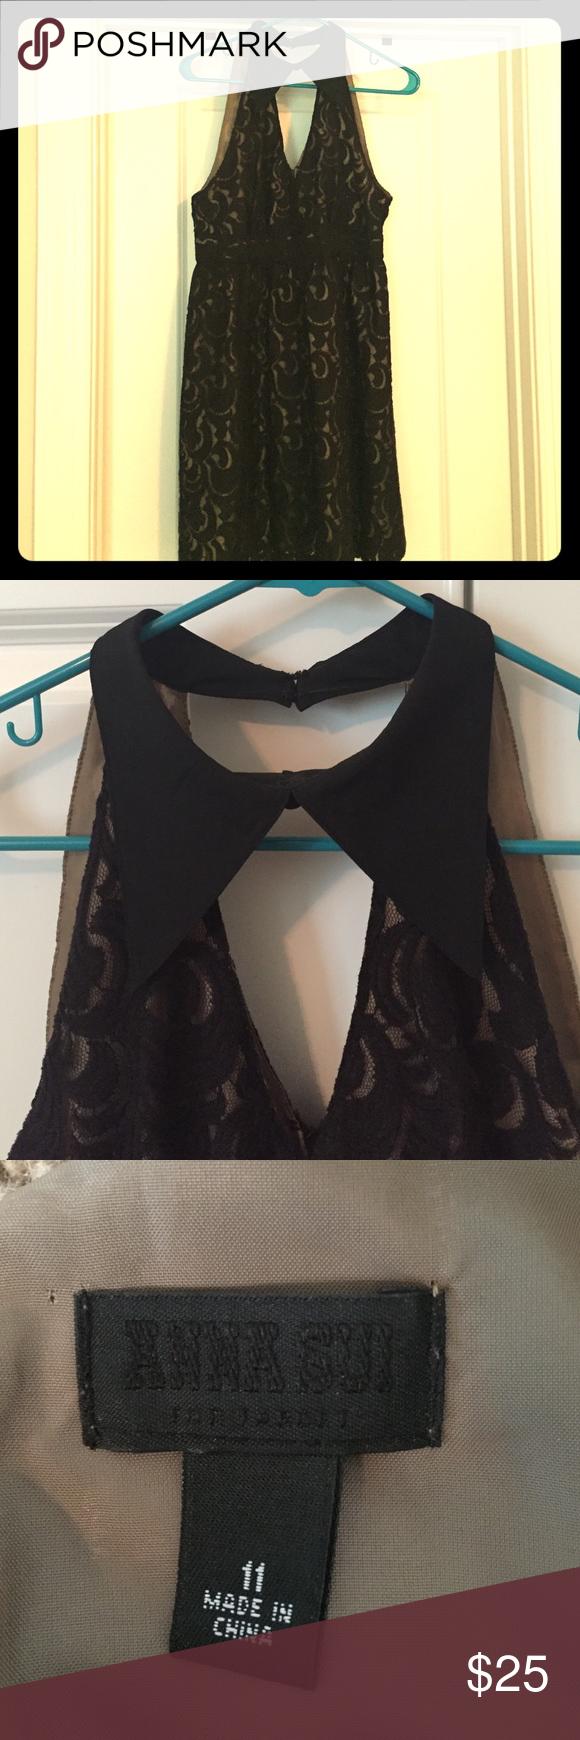 Anna Sui for Target black, lace dress Fun,  black lace dress with collar. Anna Sui Dresses